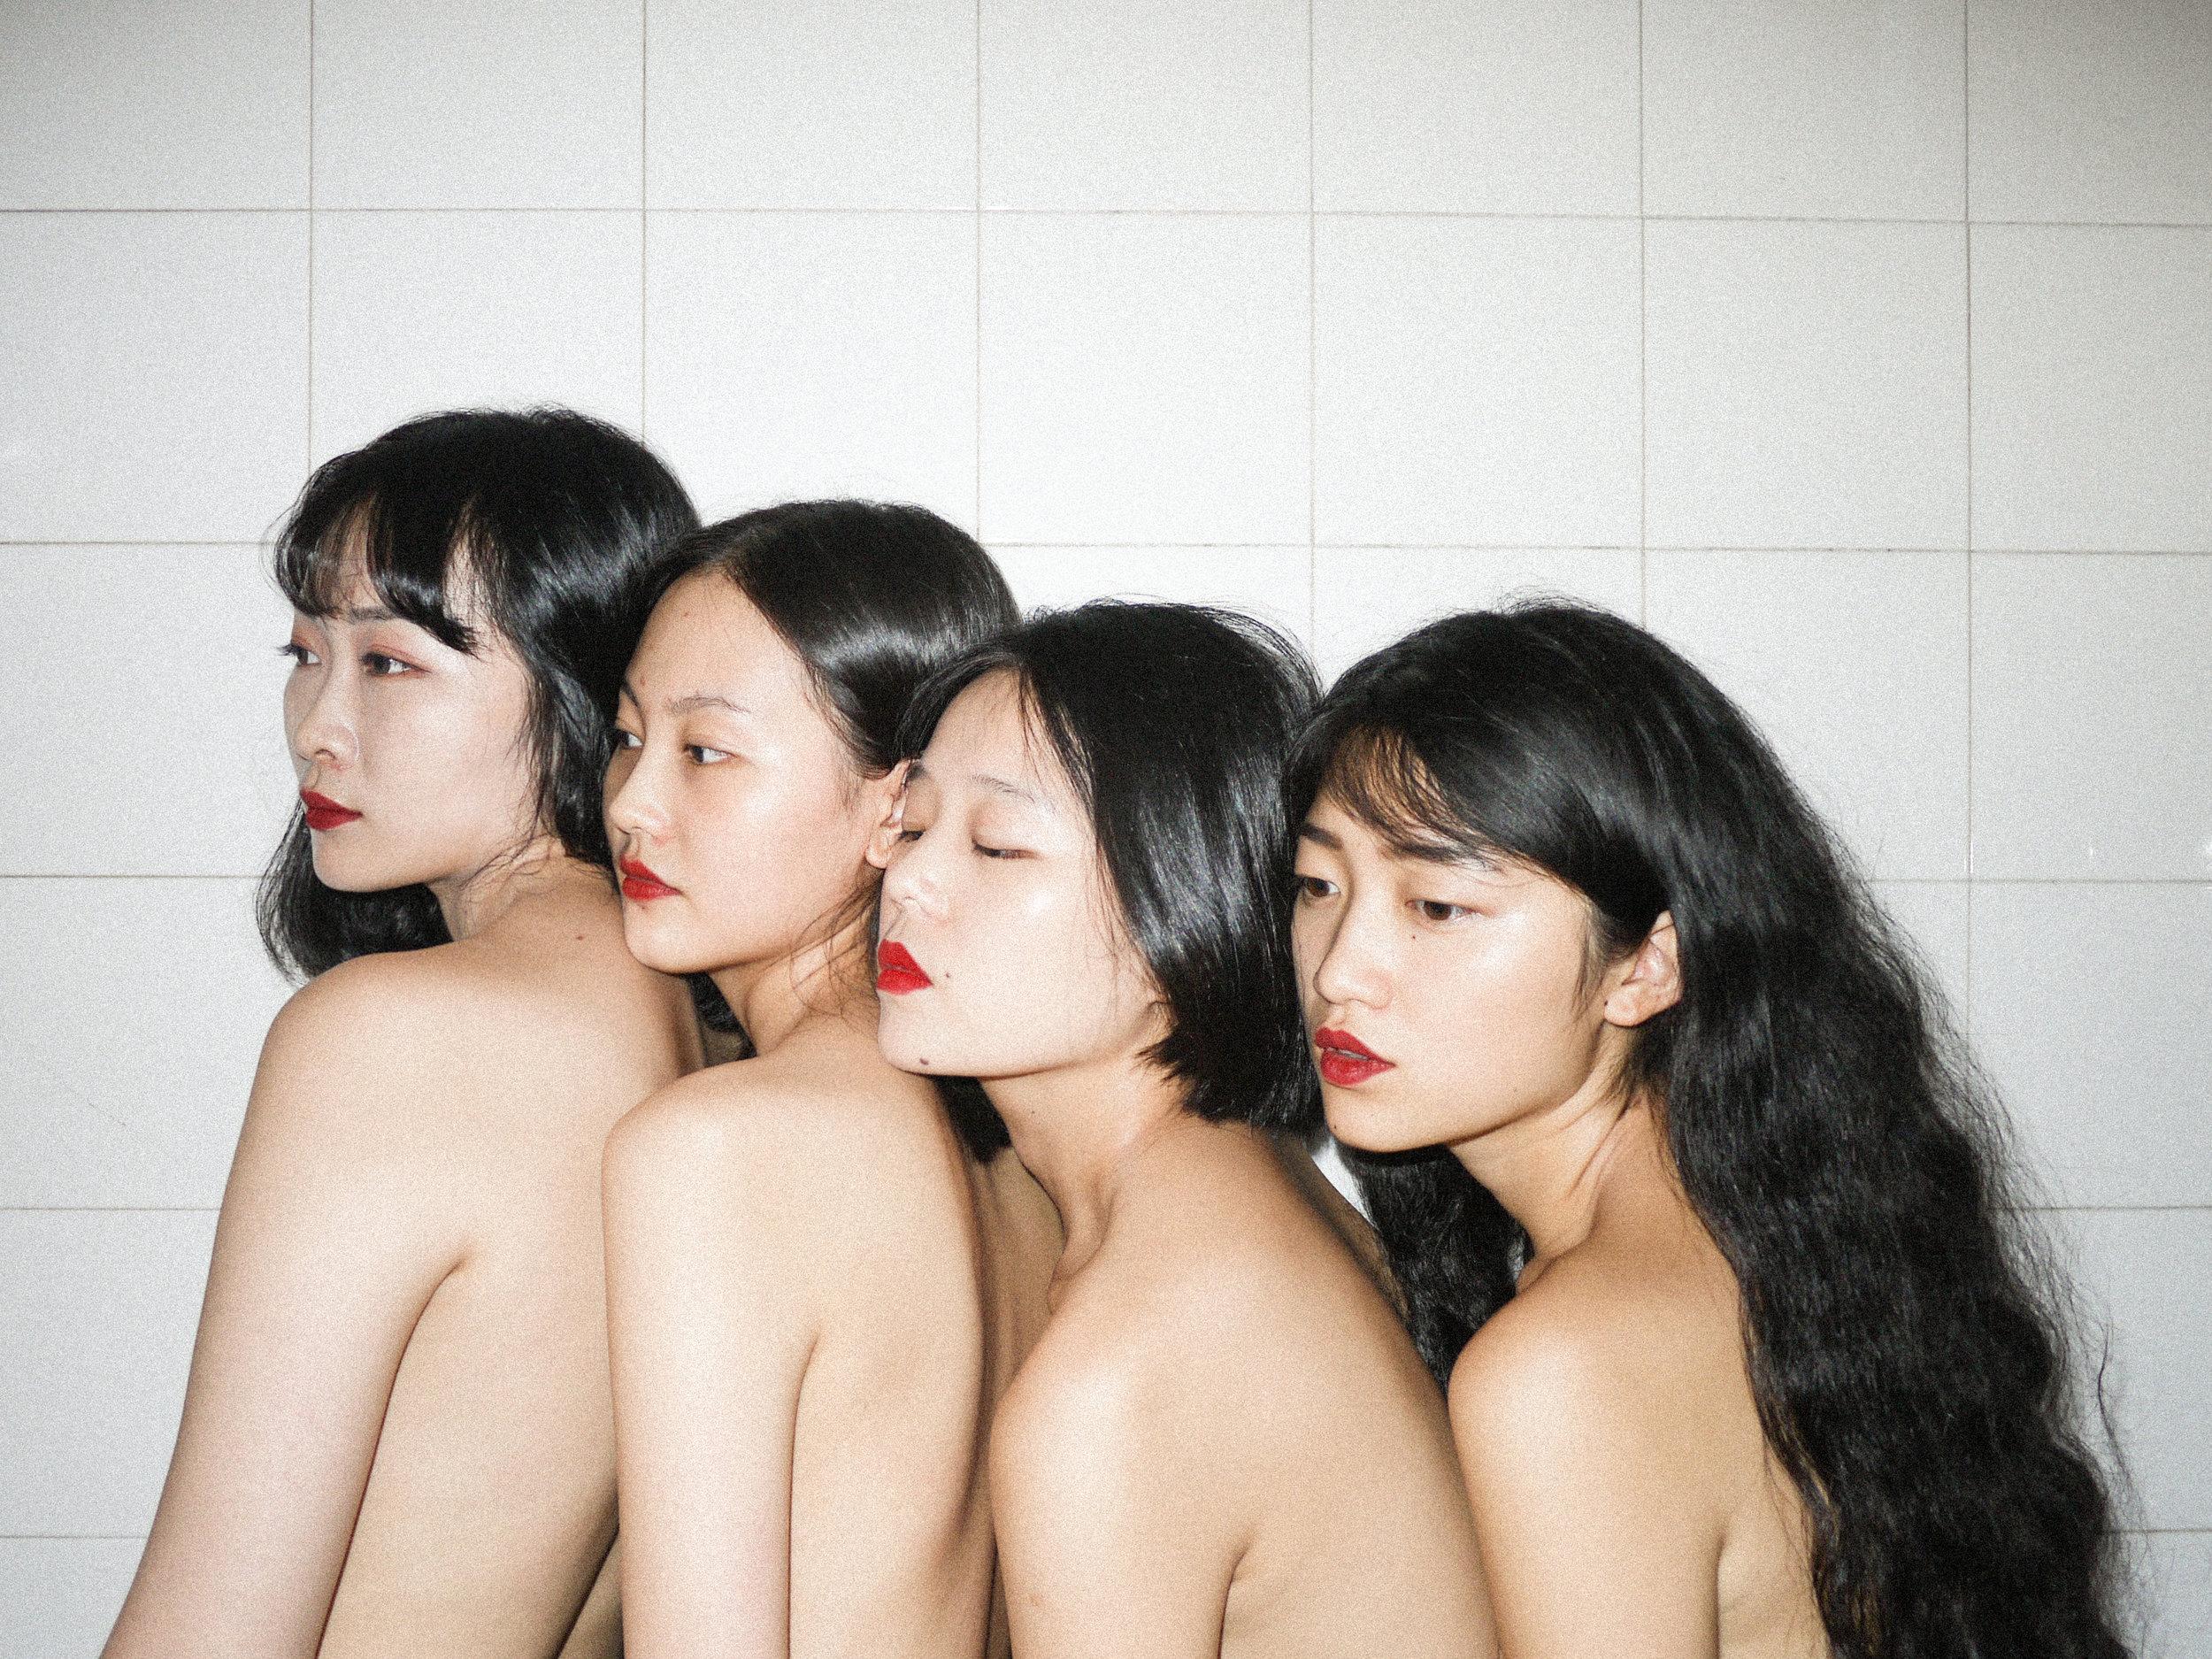 Photographer: Dangyuongji